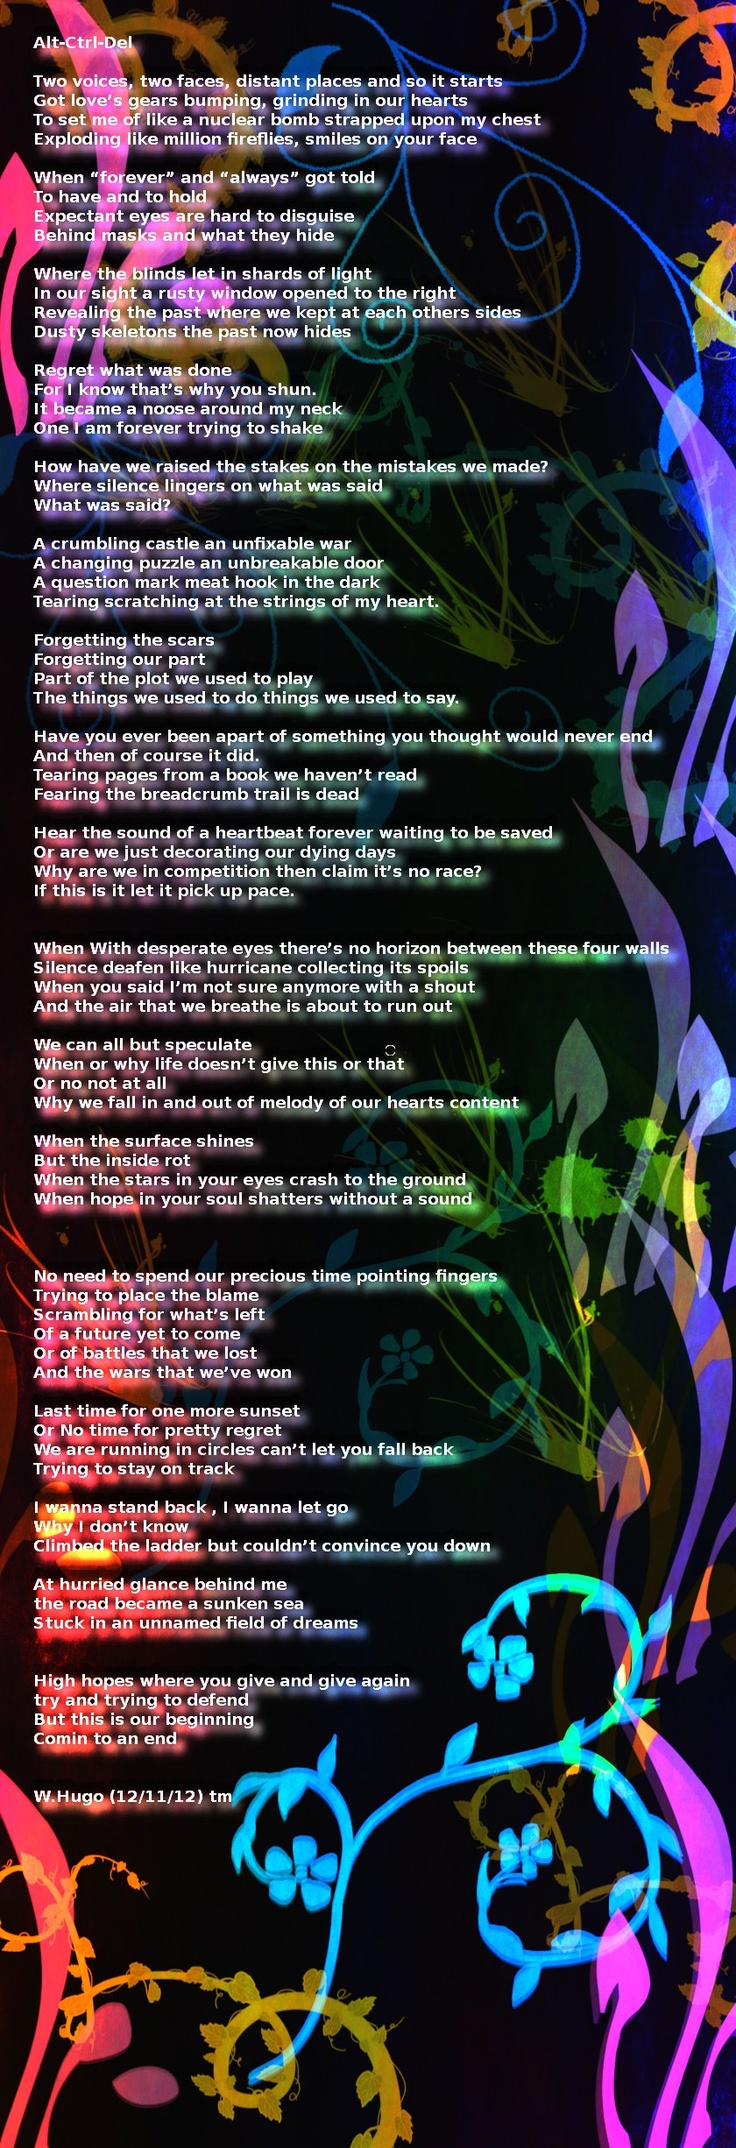 Poem I wrote :Altctrldel(tm) By W.Hugo